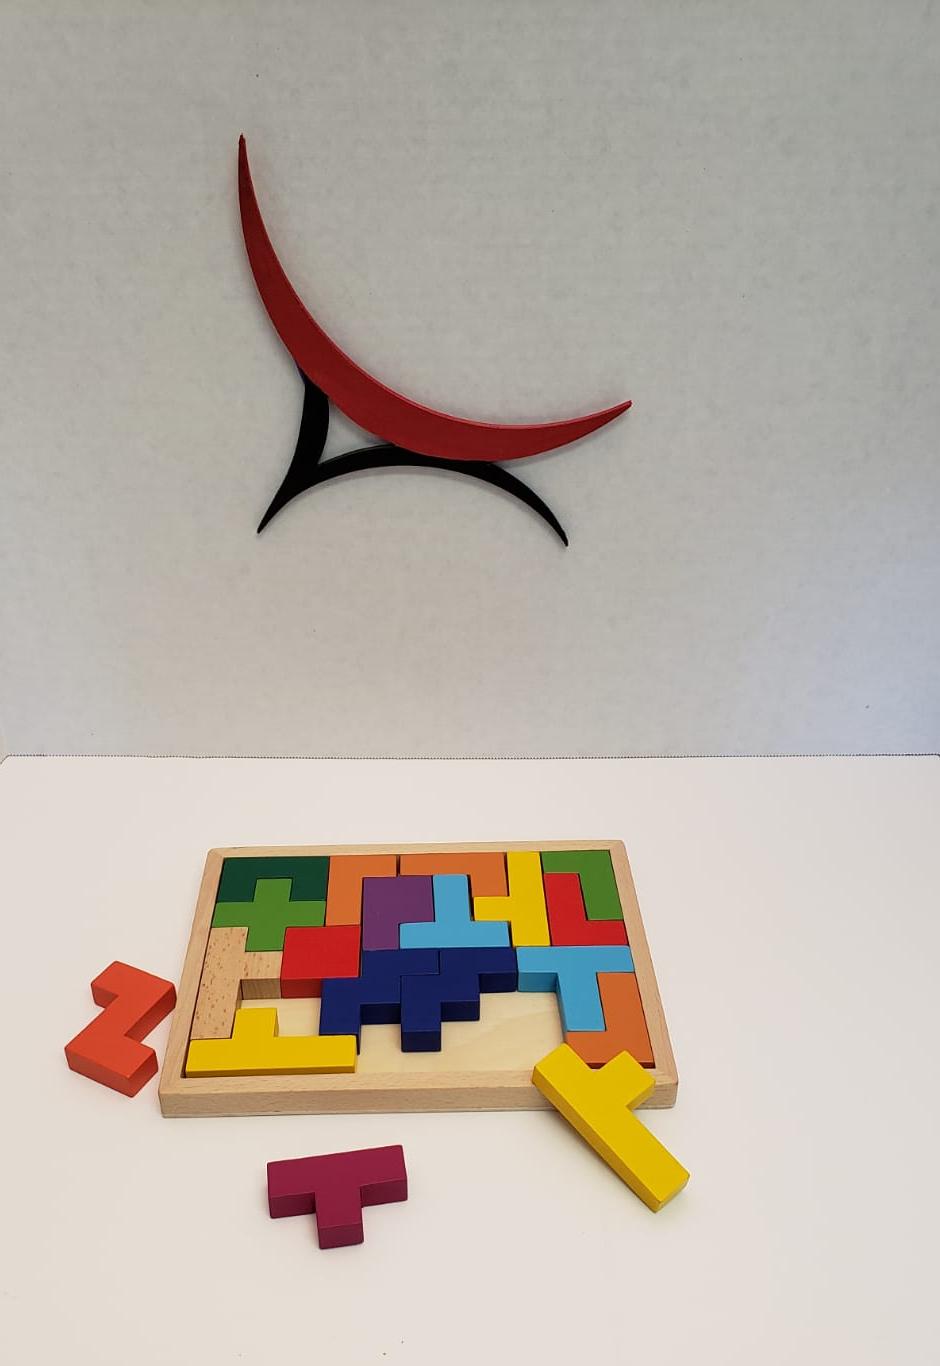 Montessori Tetris Puzzle Wooden 3d Blocks Jigsaw Puzzle